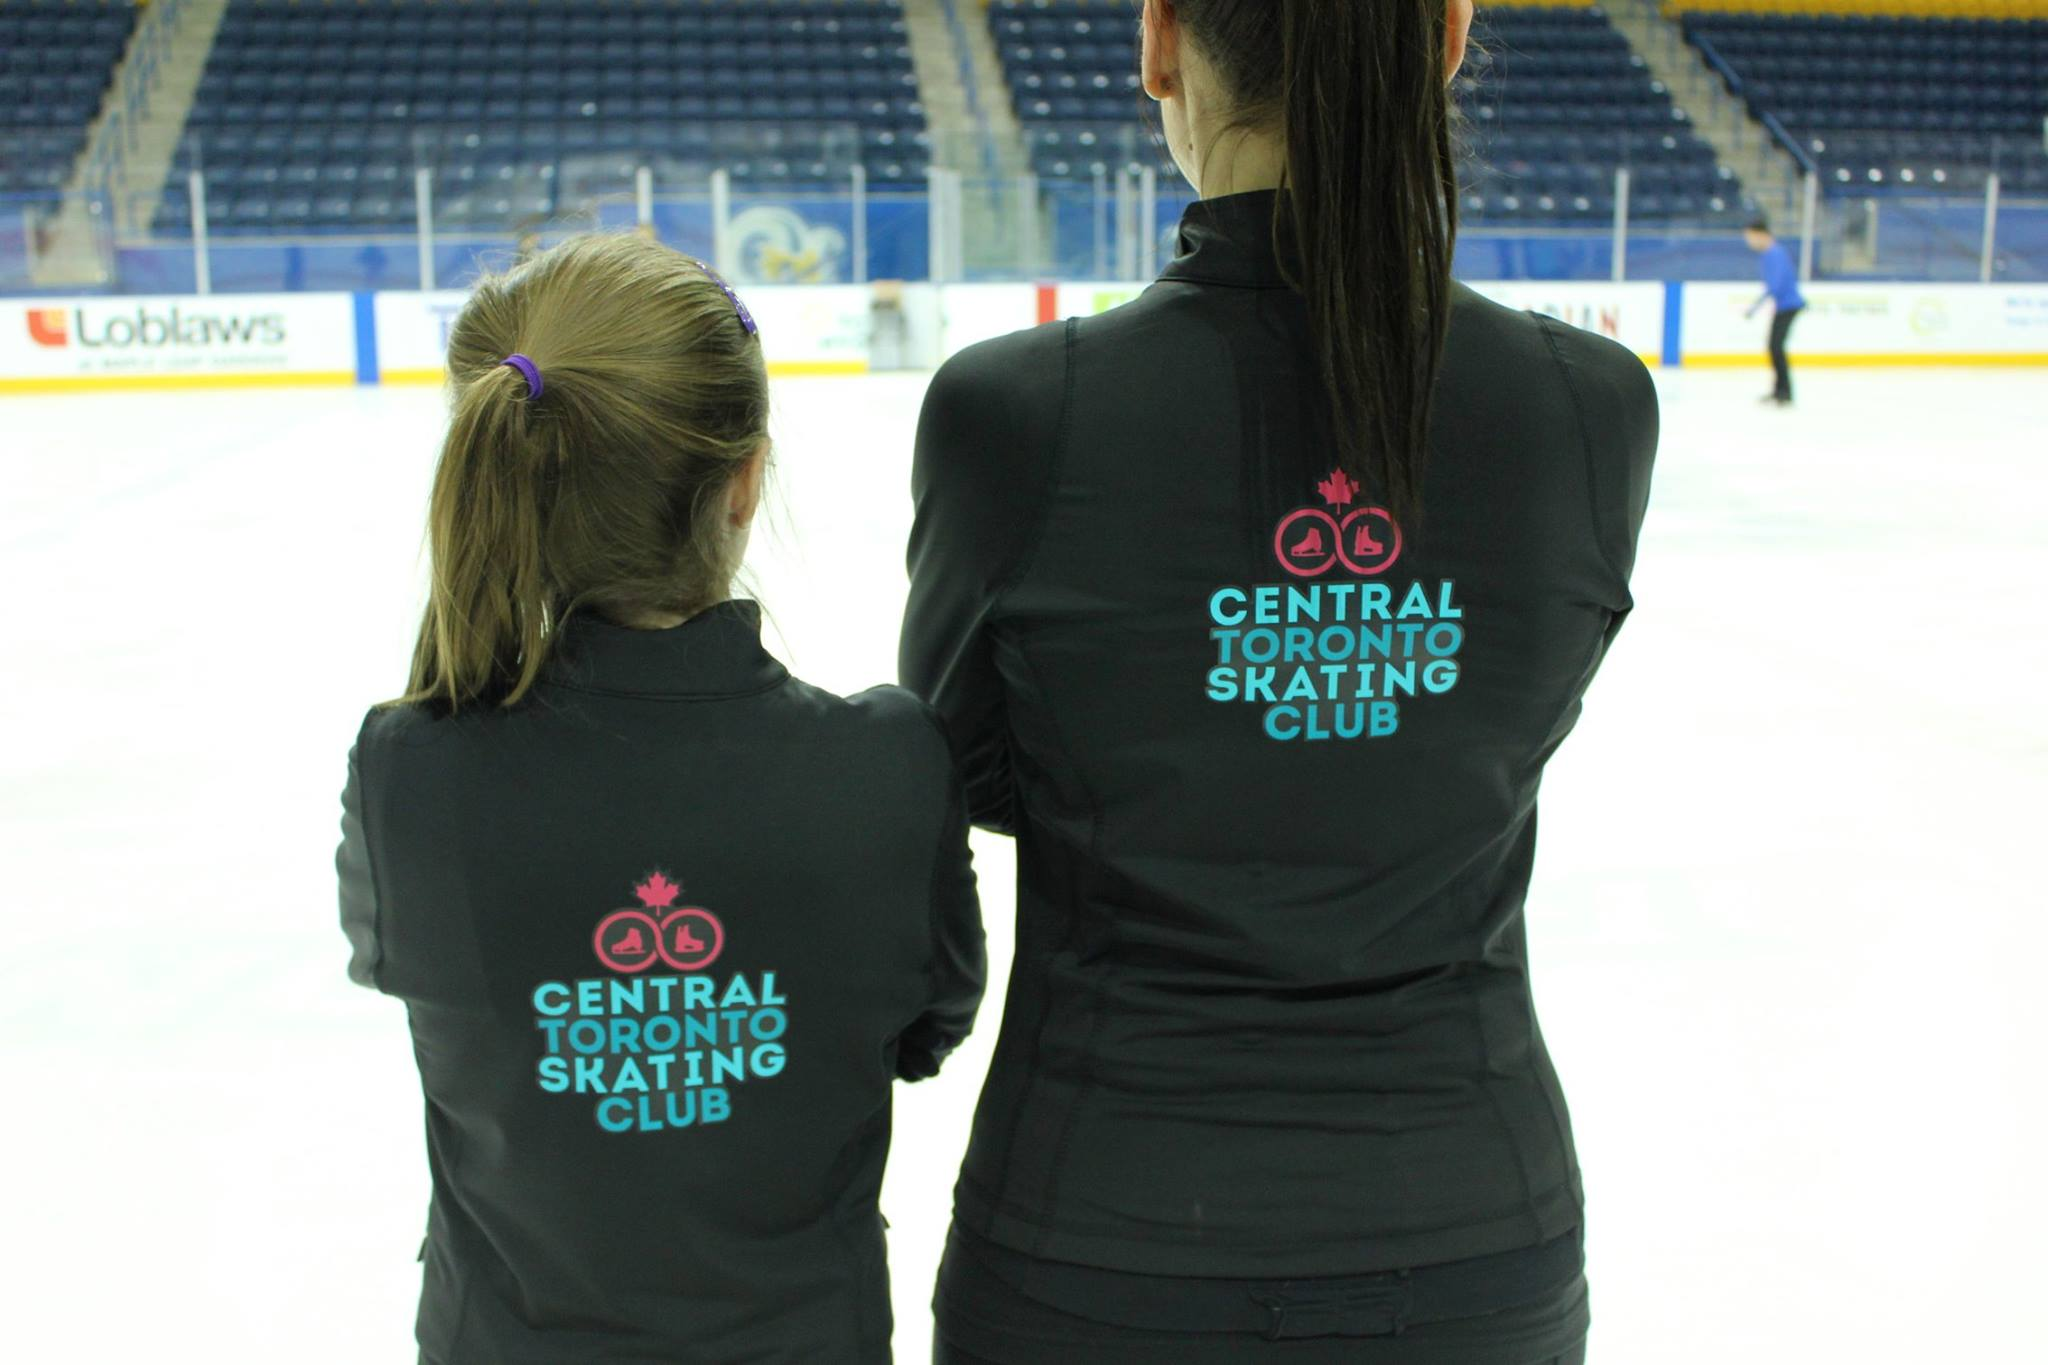 Roller skating rink etobicoke - Skip To Content